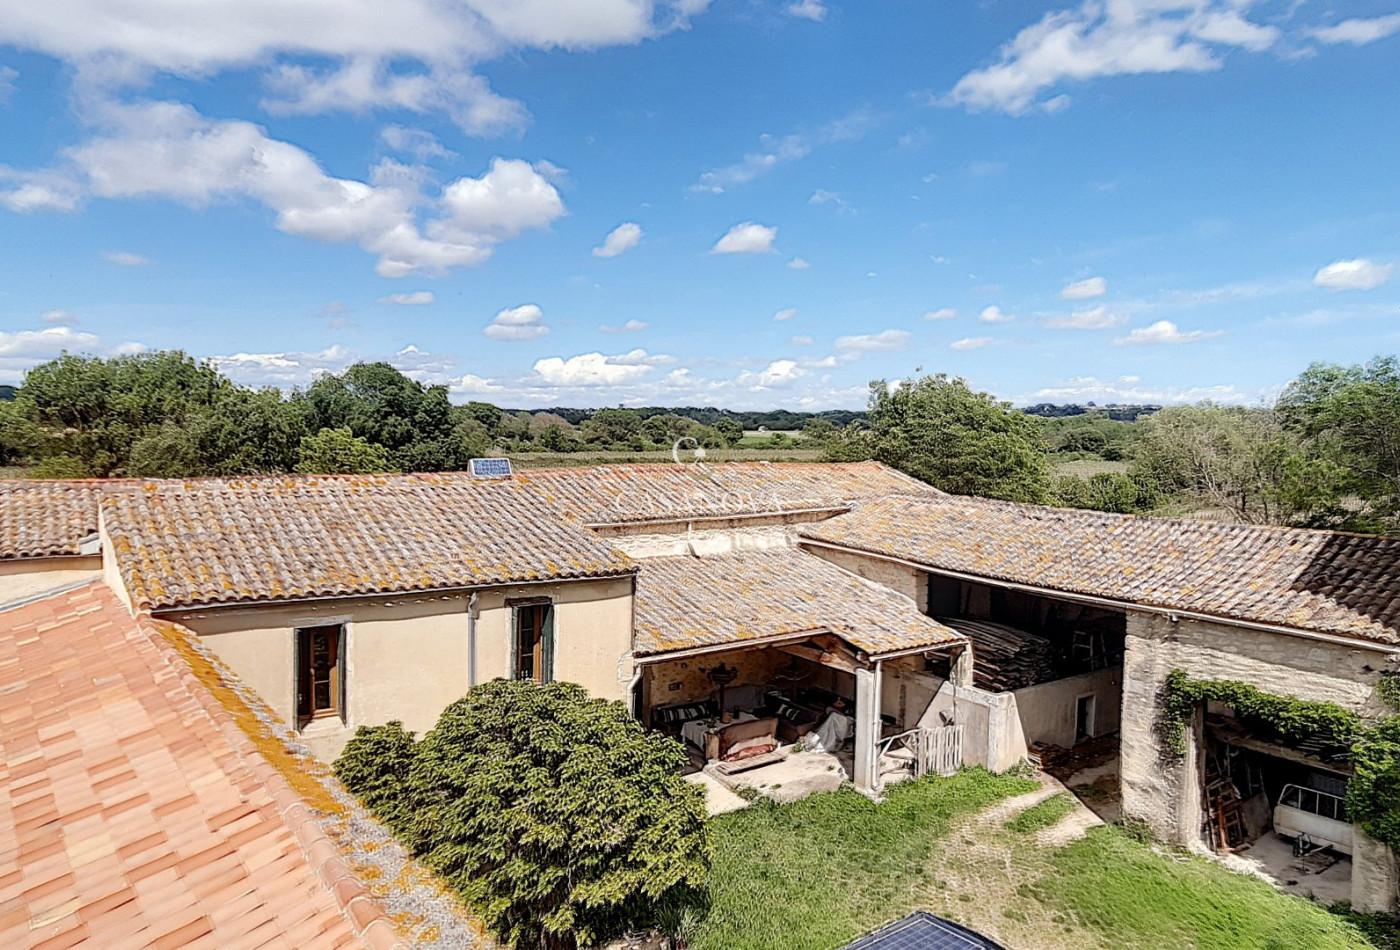 A vendre  Montpellier   Réf 340138671 - Agence galerie casanova